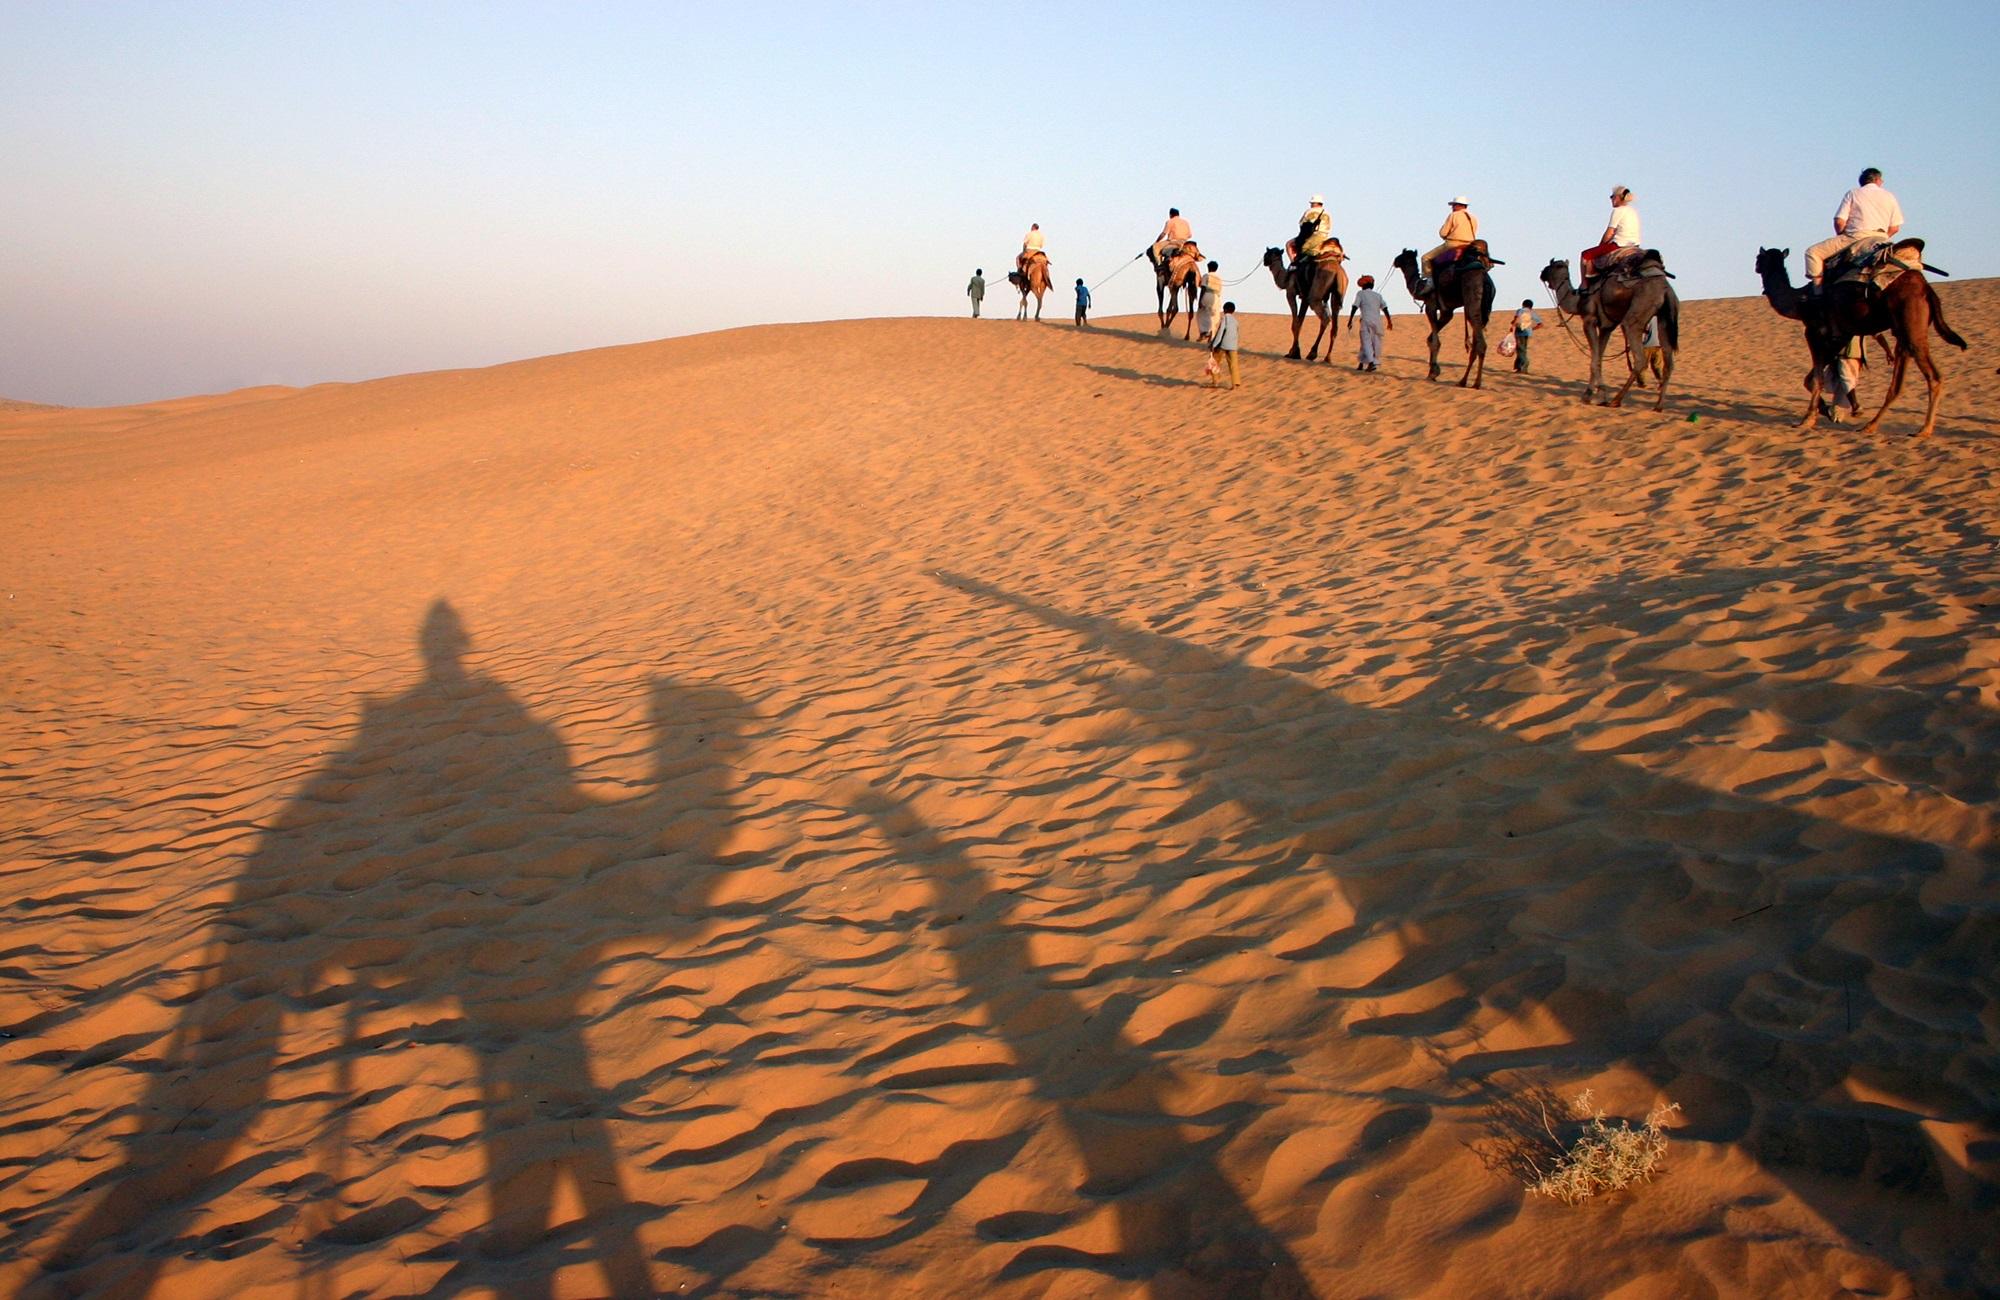 Voyage en Inde - Désert du Thar - Amplitudes